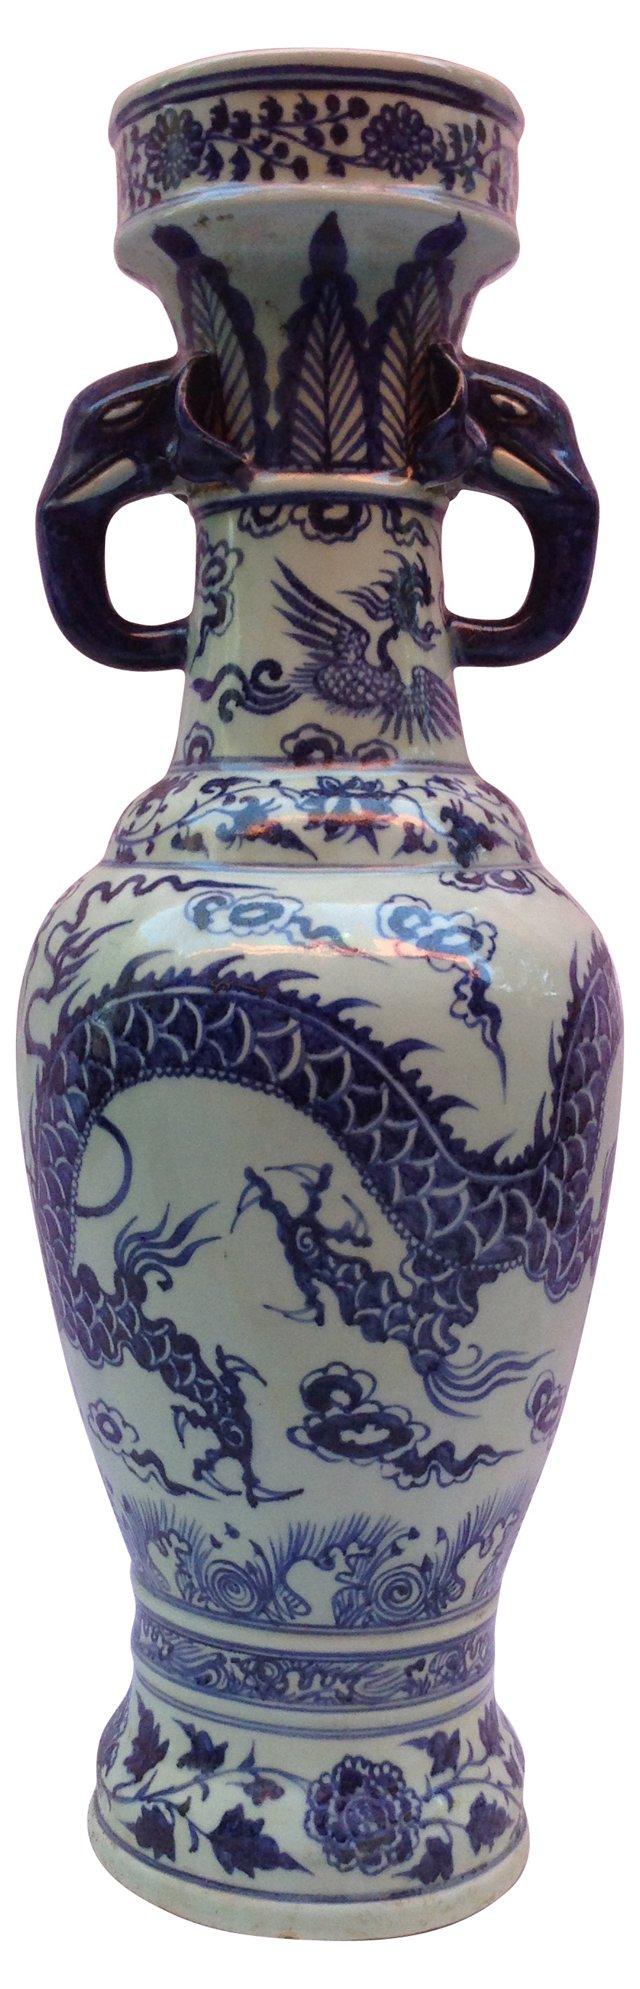 Dragon Vase w/ Elephant Handles